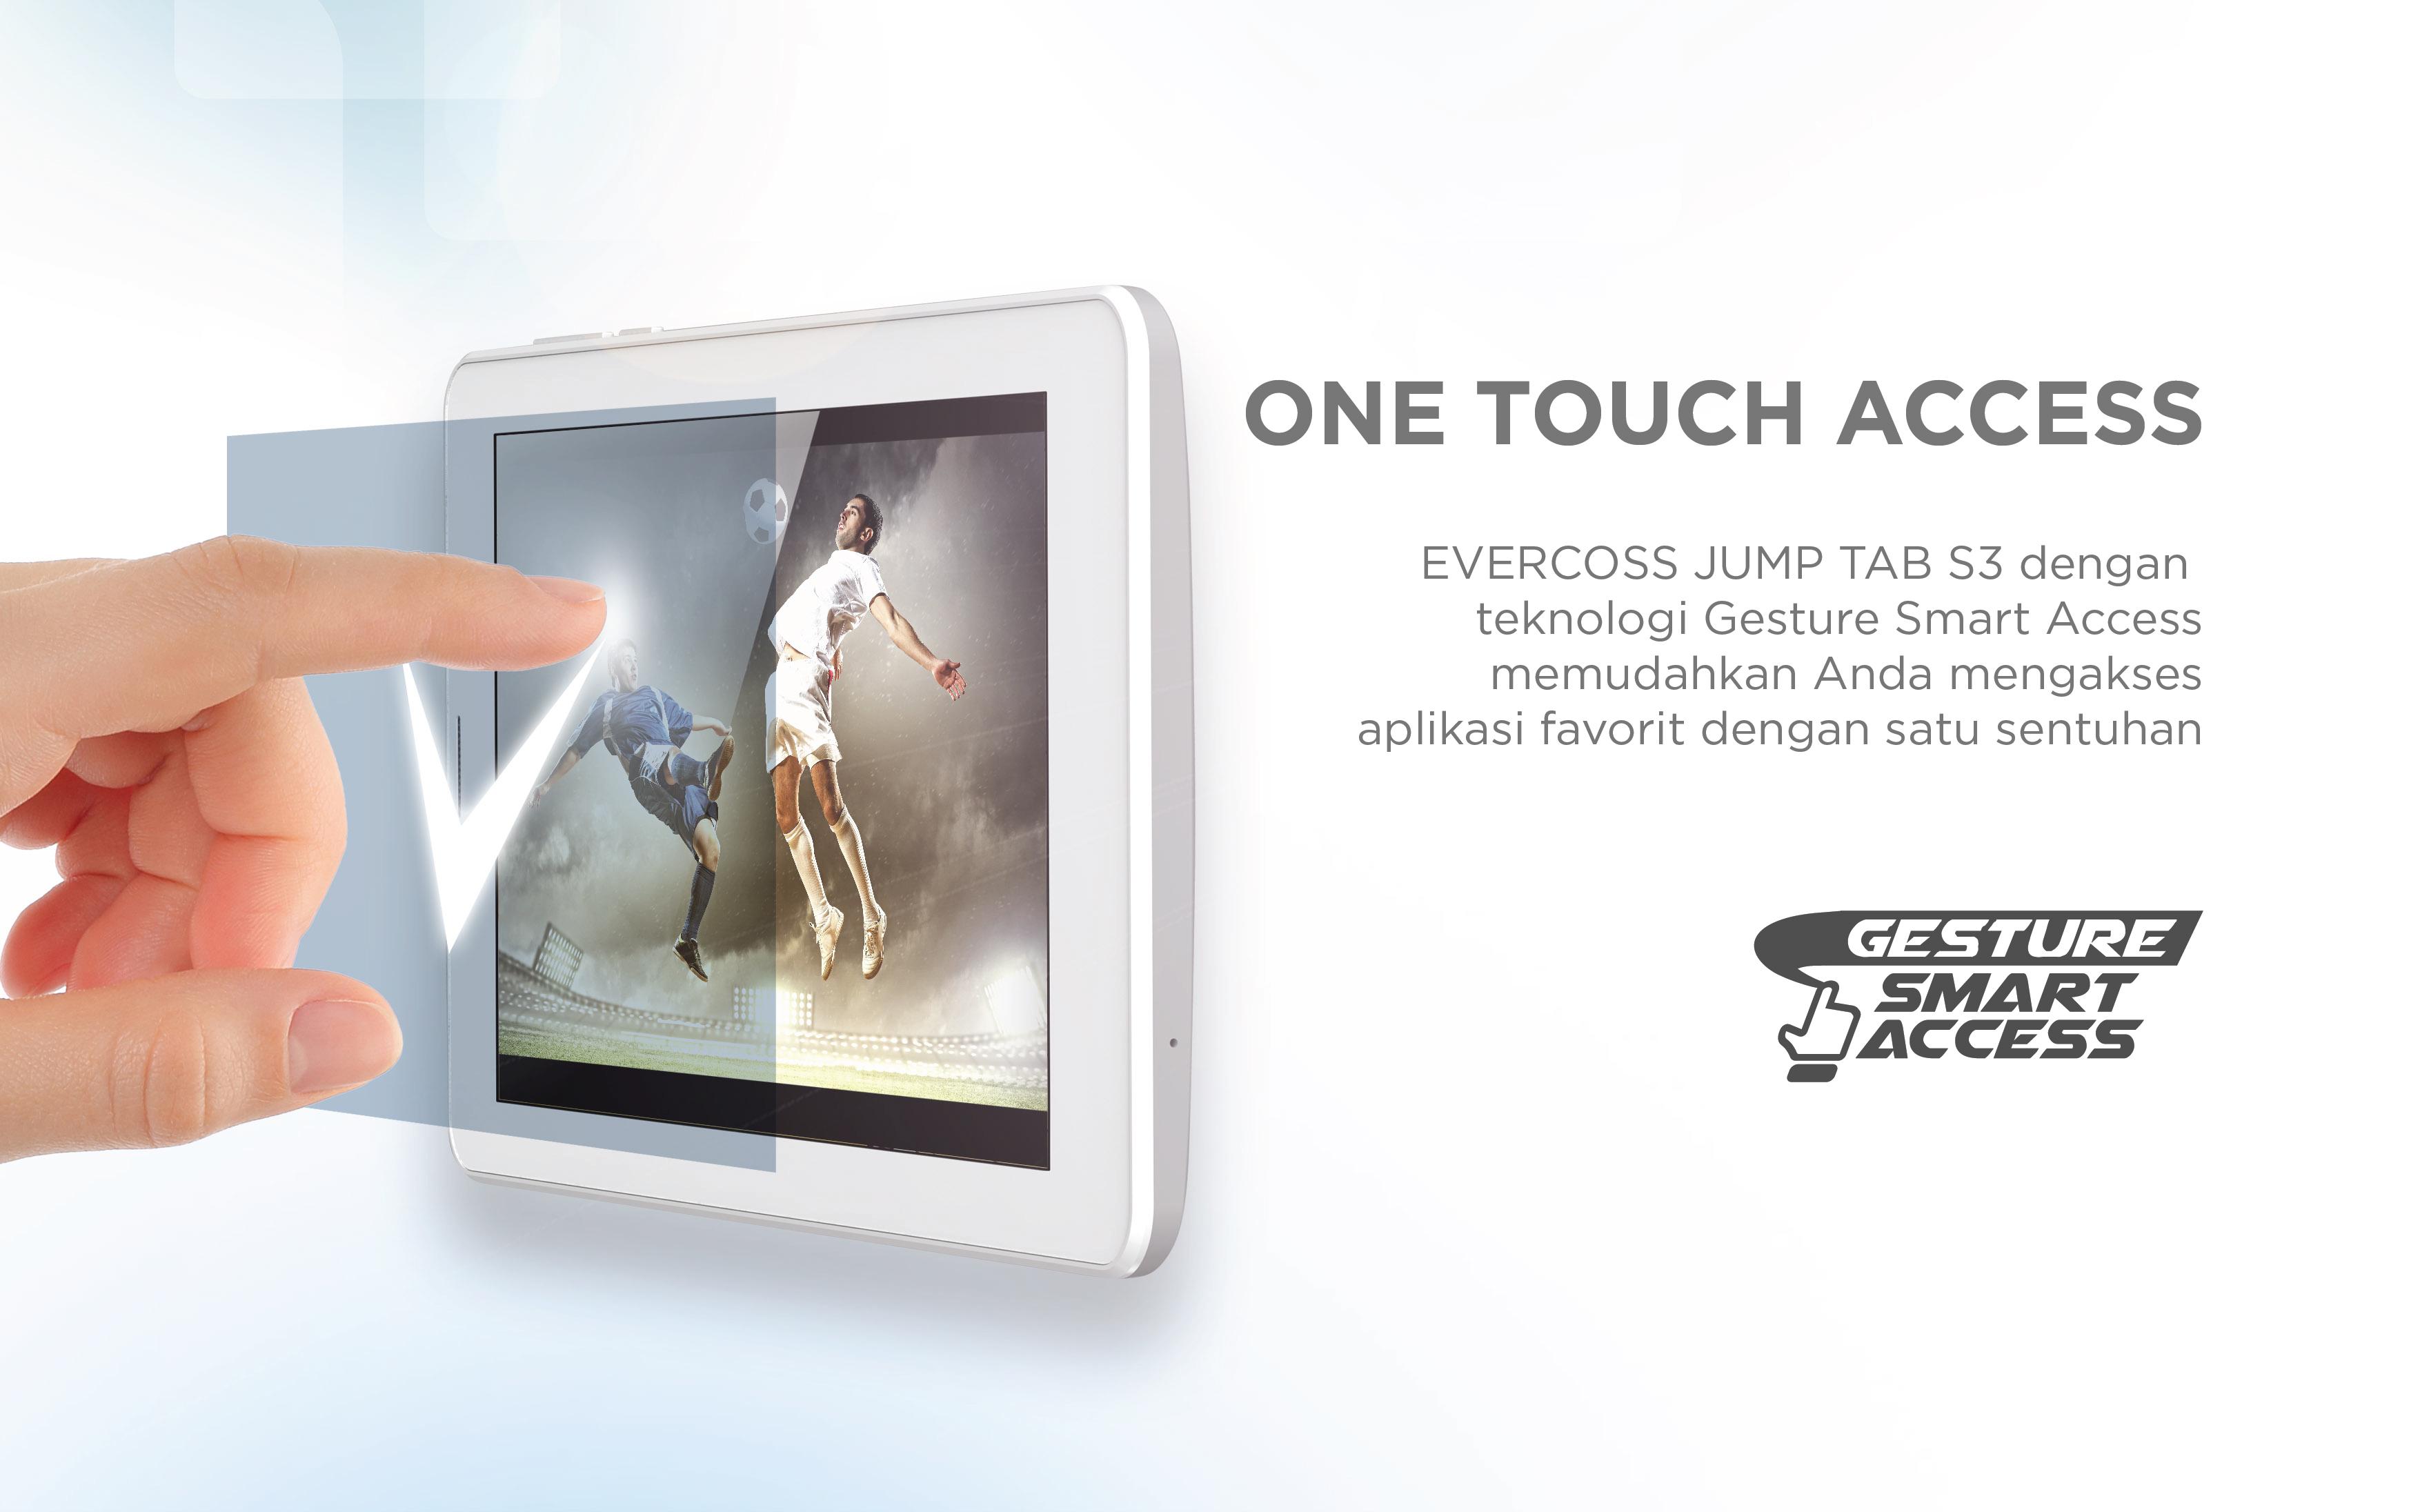 Fitur Evercoss Jump Tab S3